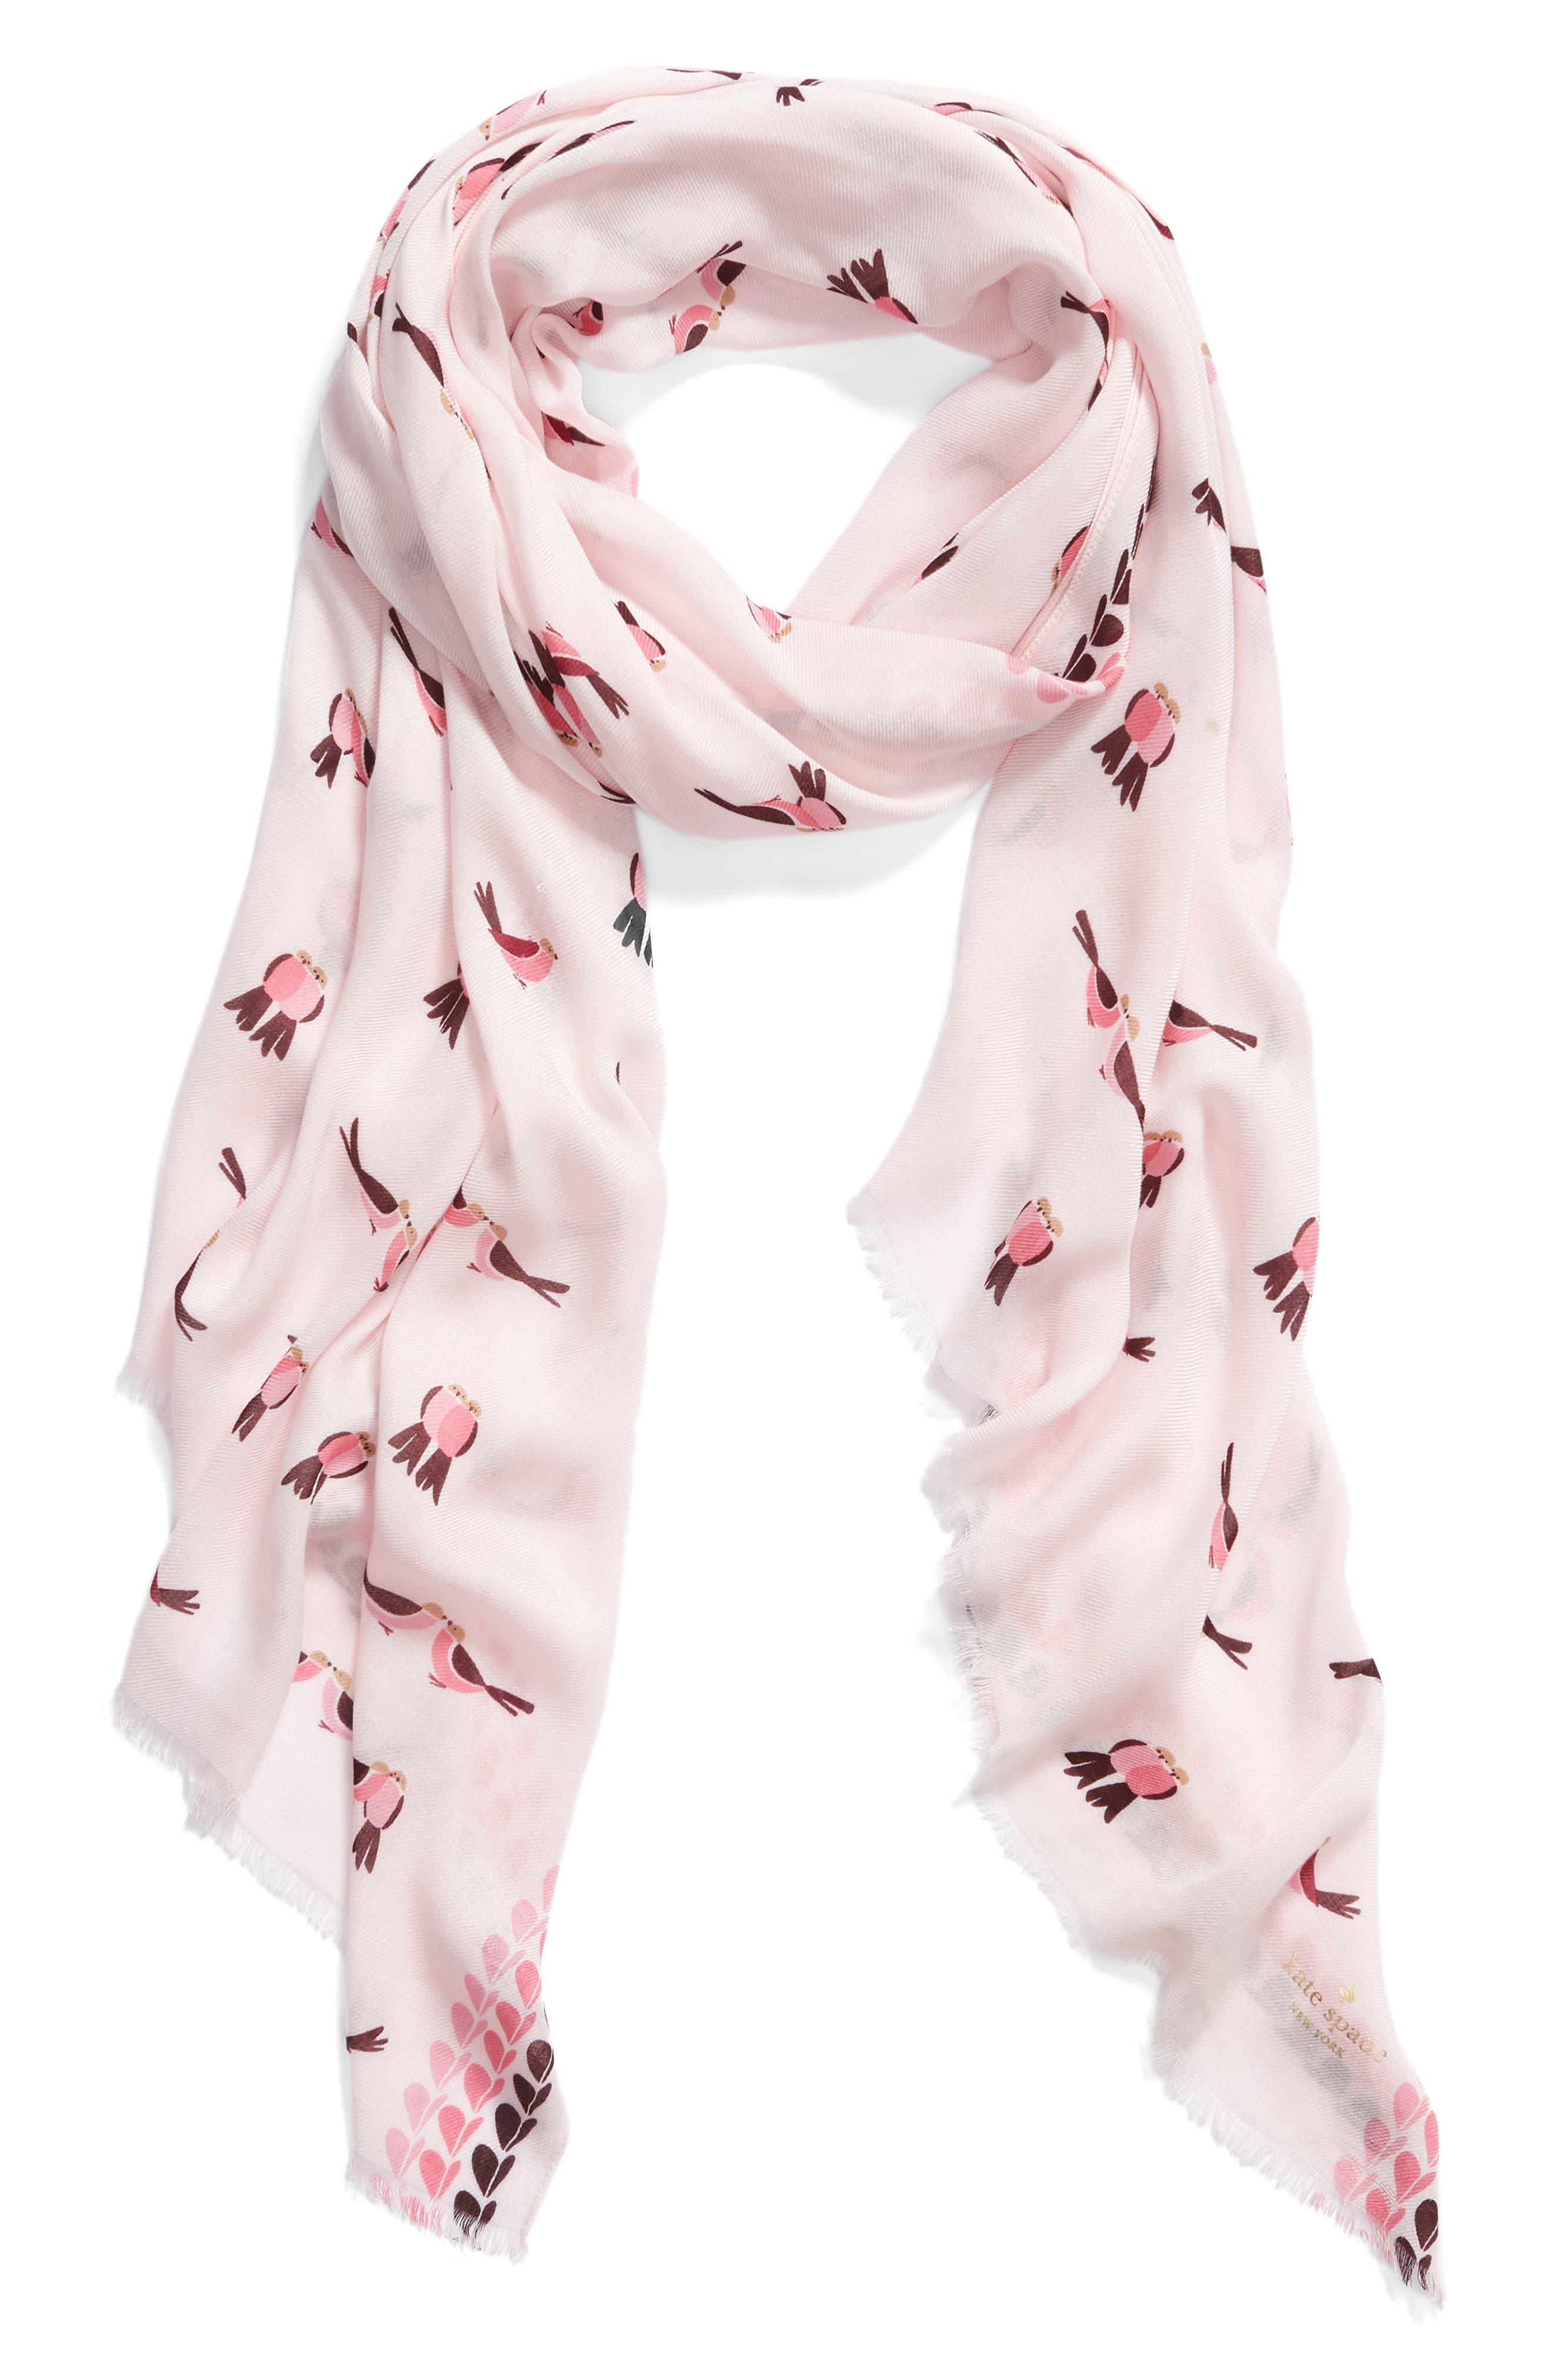 KATE SPADE NEW YORK,                             lovebirds scarf,                             Alternate thumbnail 2, color,                             PINK MAJOLICA